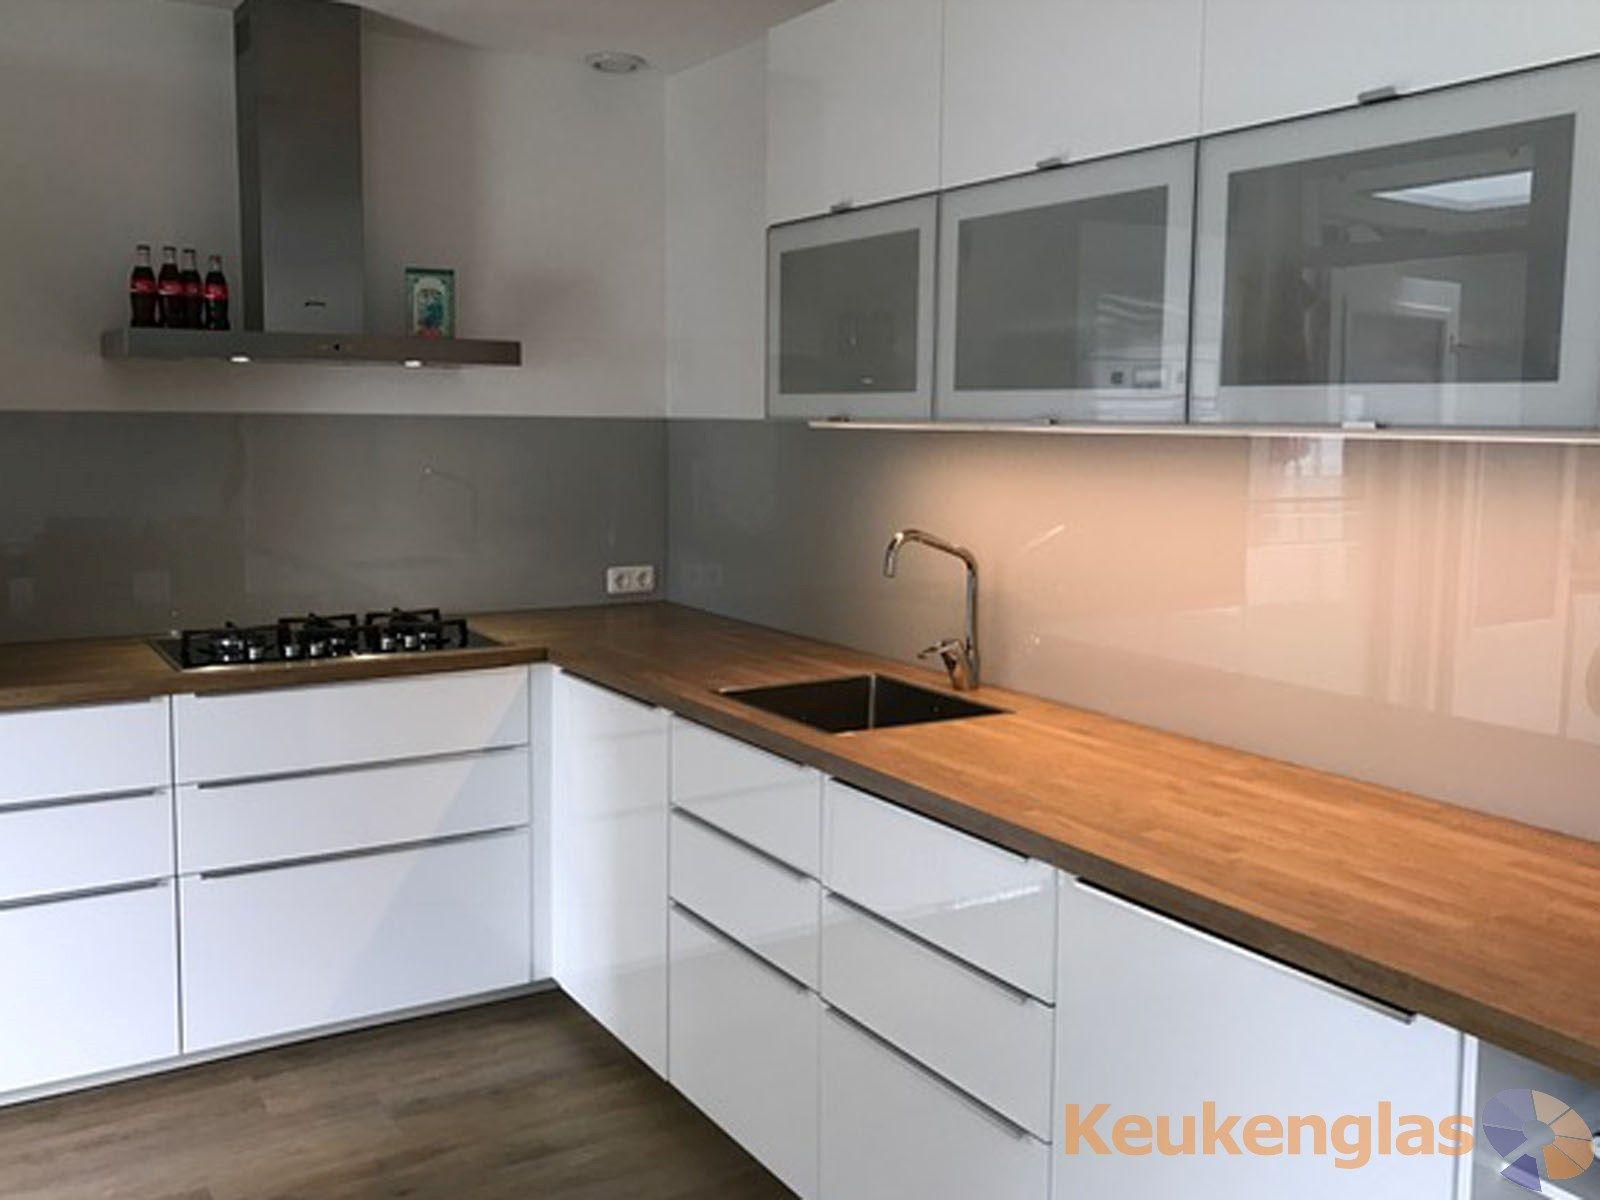 Design Keuken Groningen : Keuken achterwand glas aardetint cucina pinterest